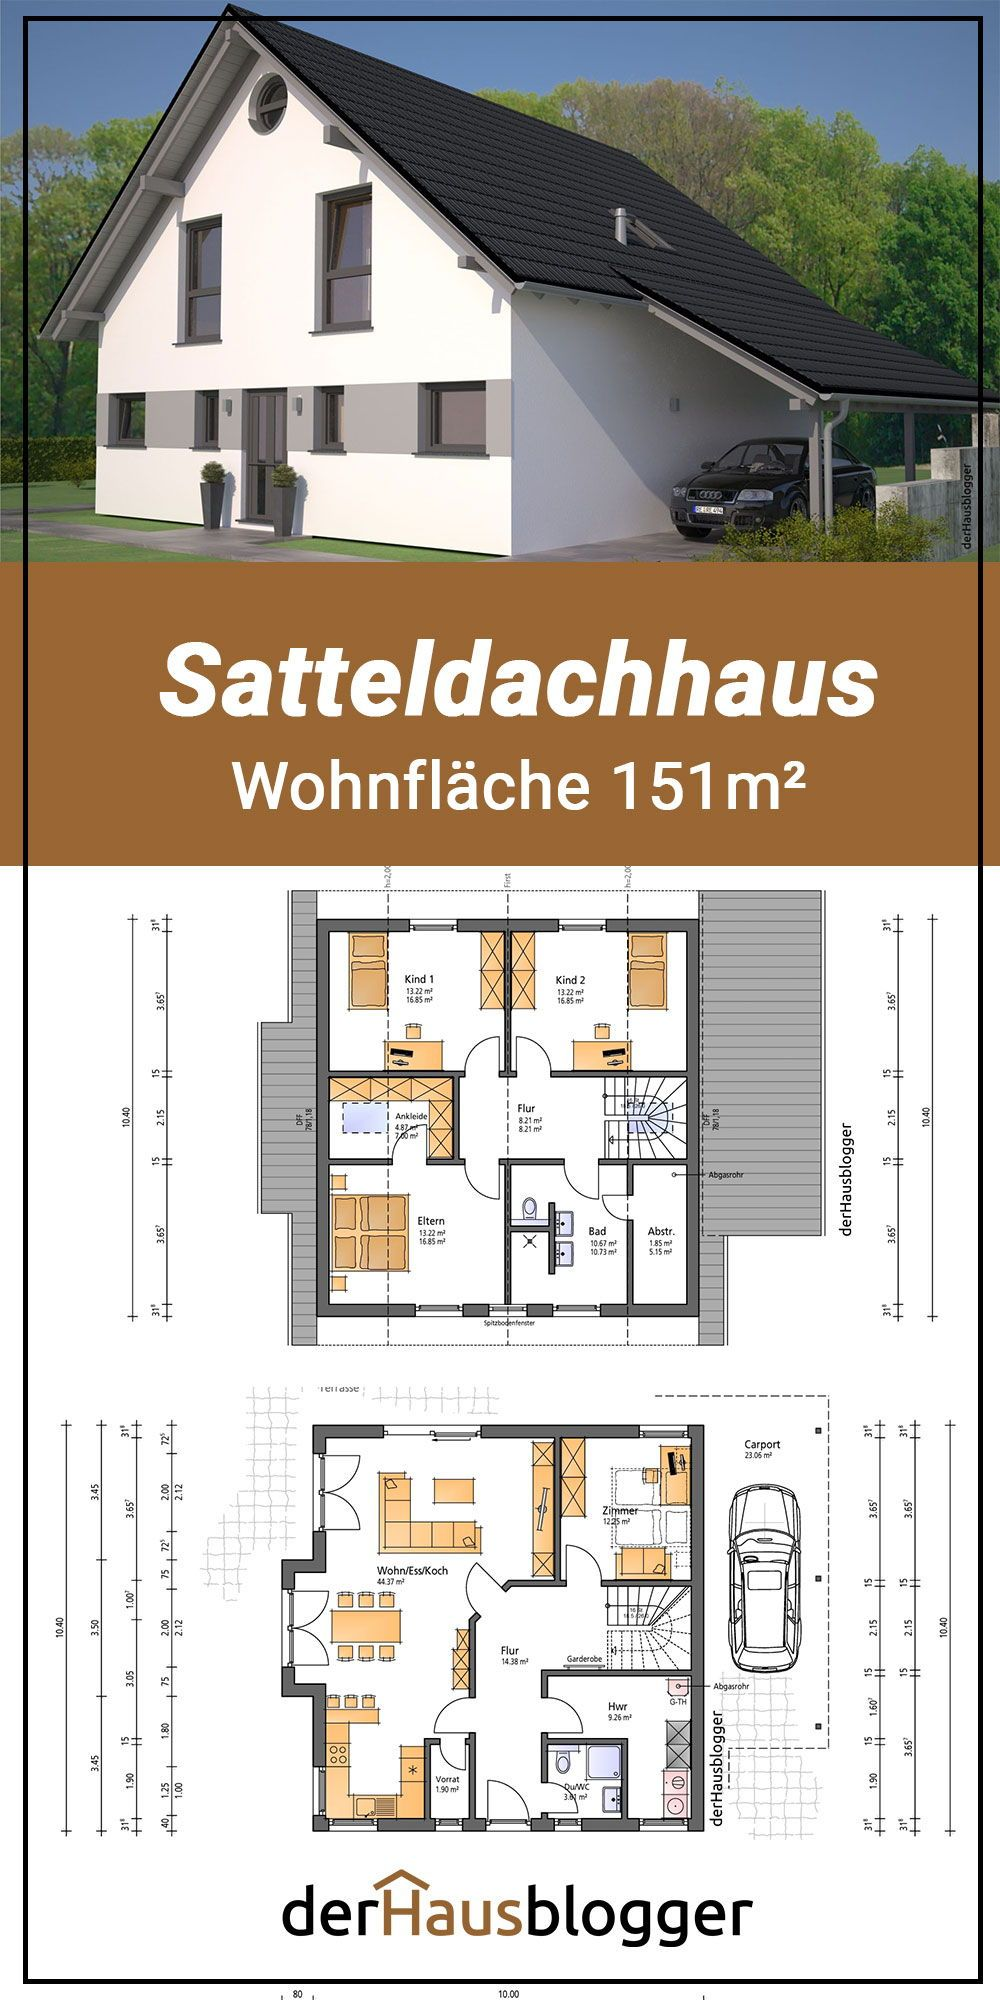 Grundriss Satteldachhaus 151m2